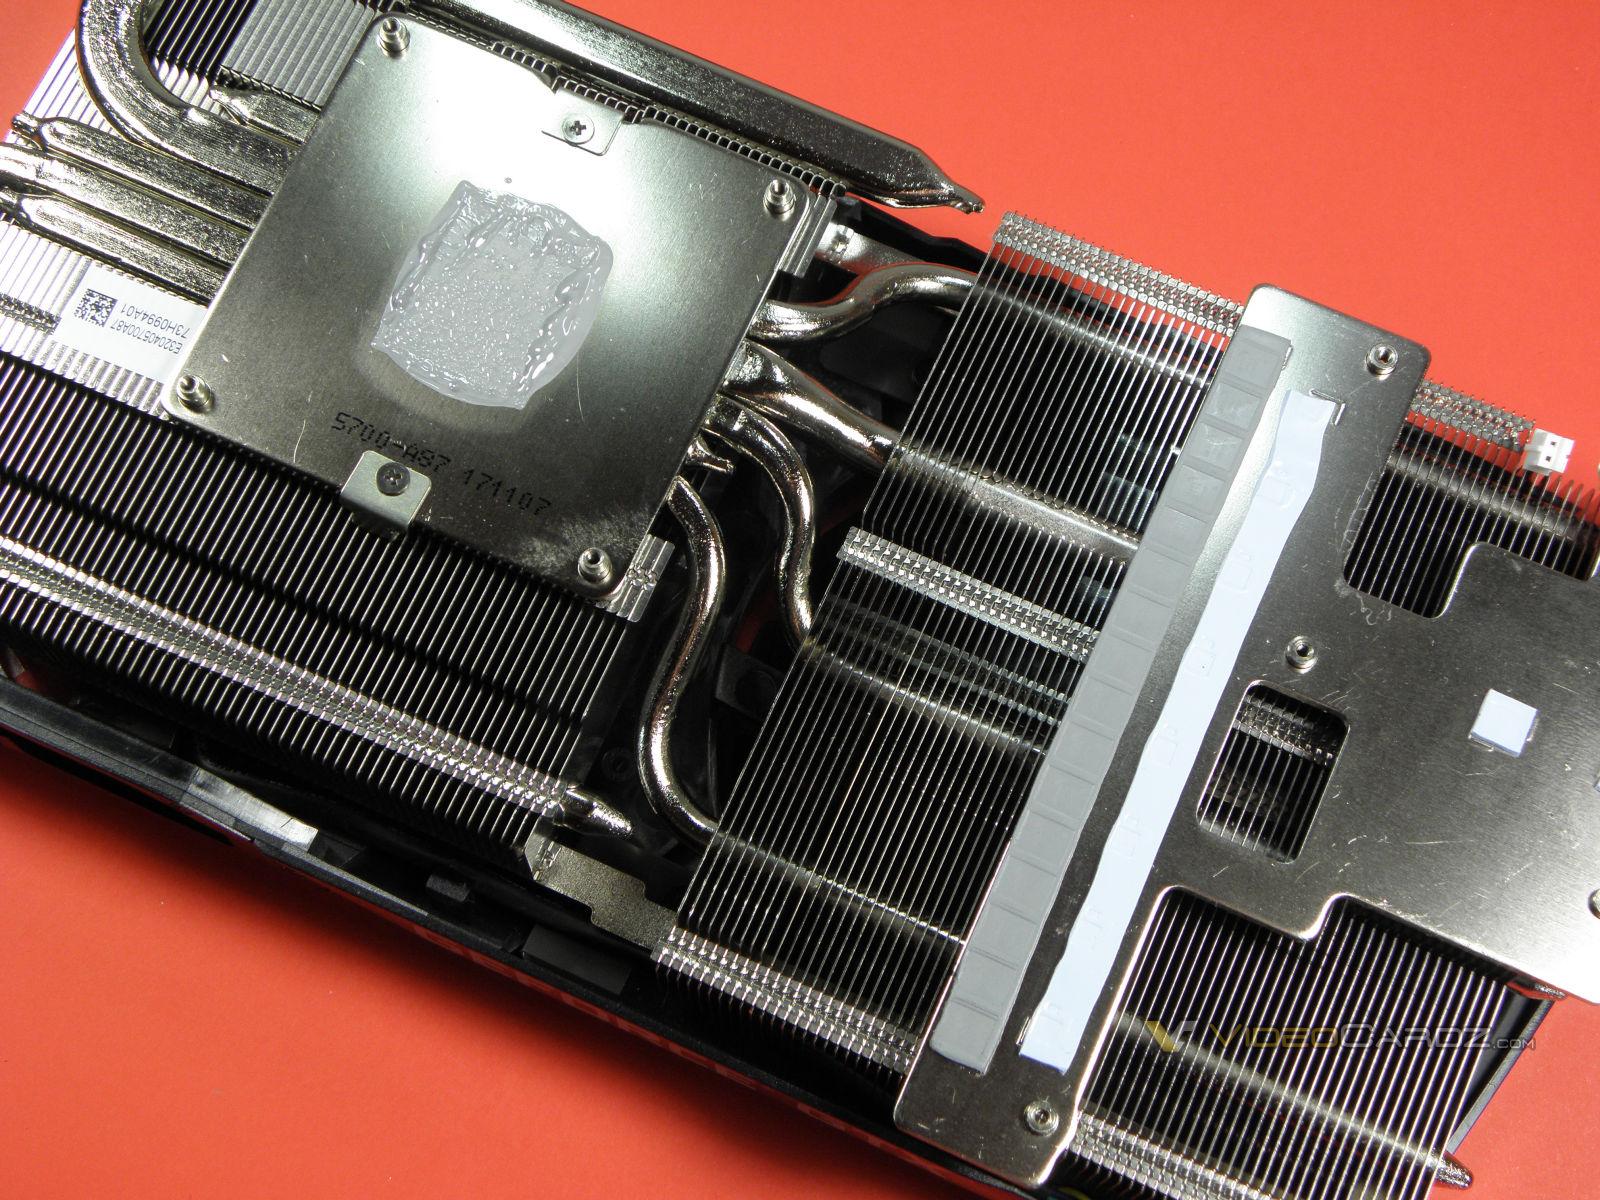 GTX 1080 Ti: chọn Asus ROG Strix, Gigabyte AORUS, Zotac PGF